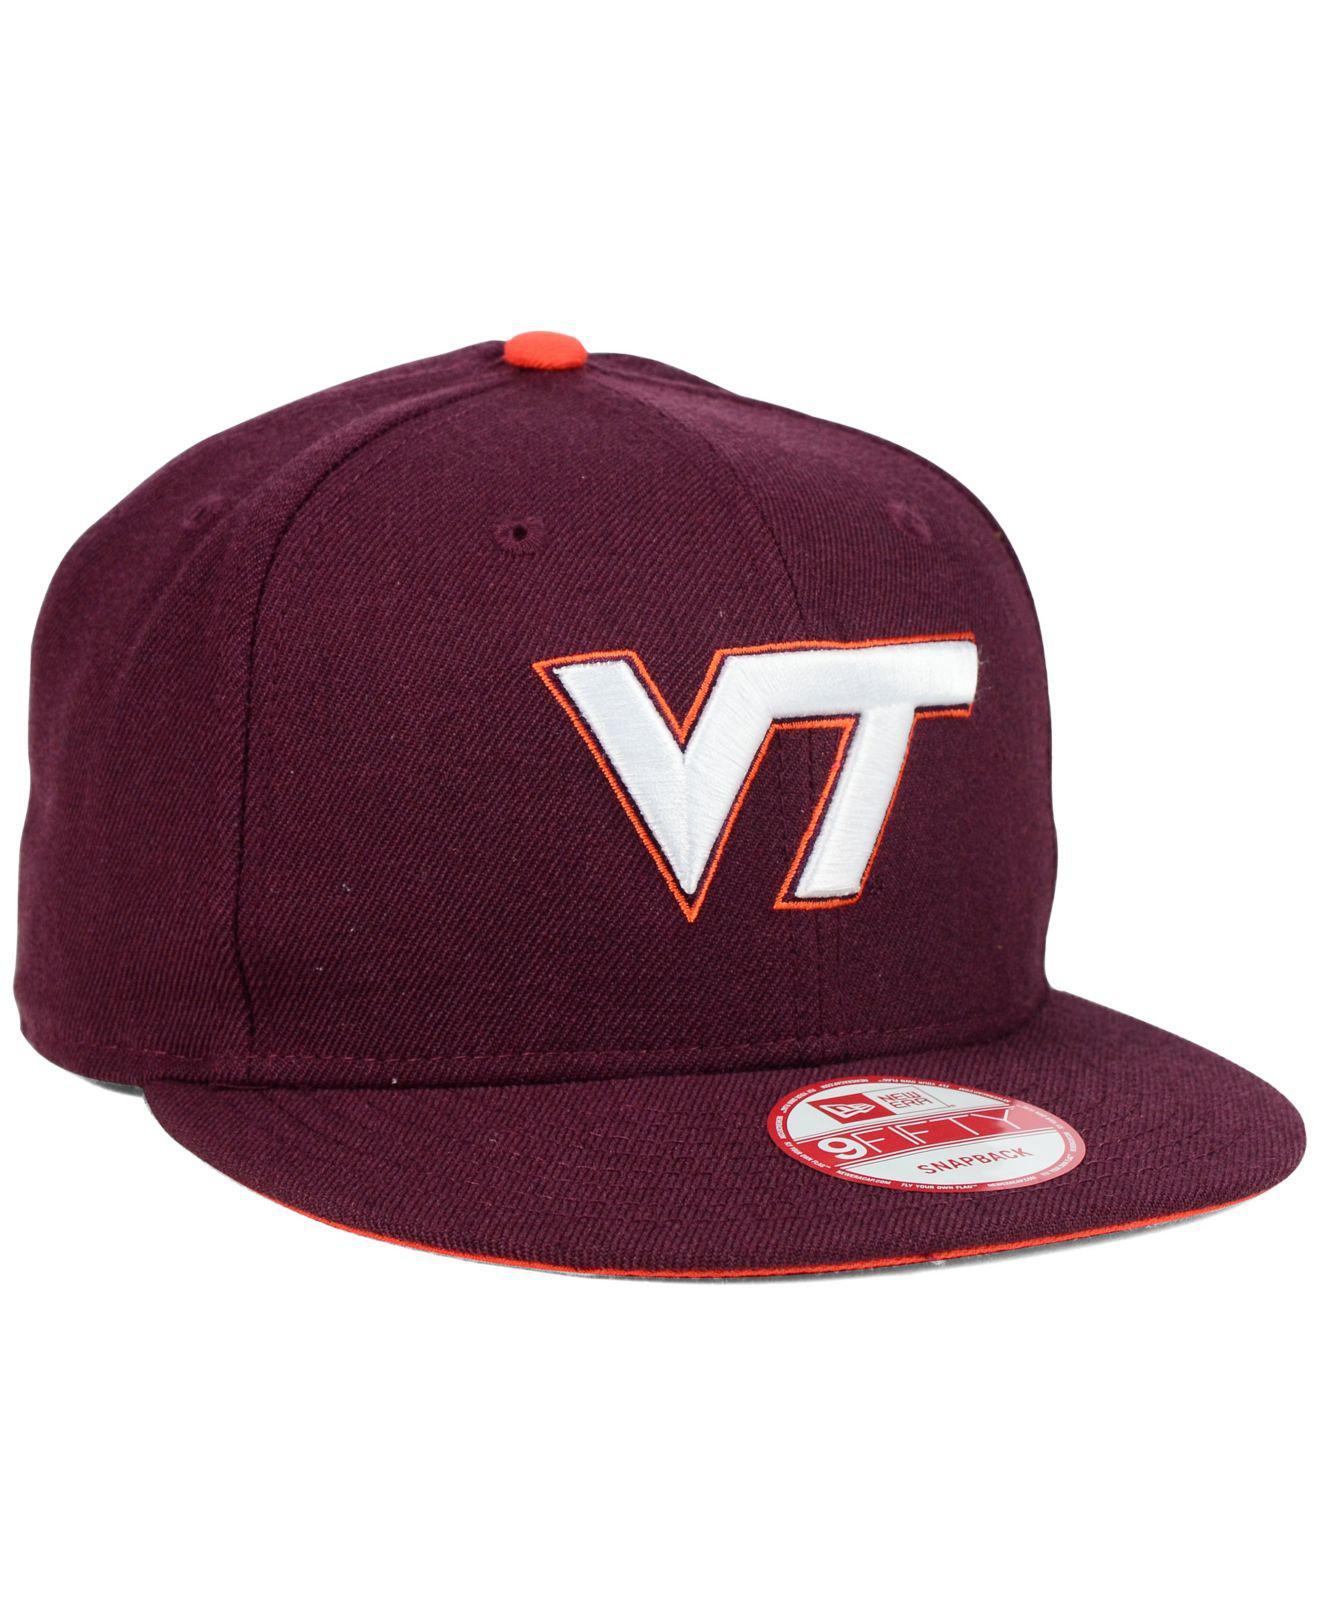 pretty nice 8303f cb7f3 KTZ - Purple Virginia Tech Hokies Core 9fifty Snapback Cap for Men - Lyst.  View fullscreen